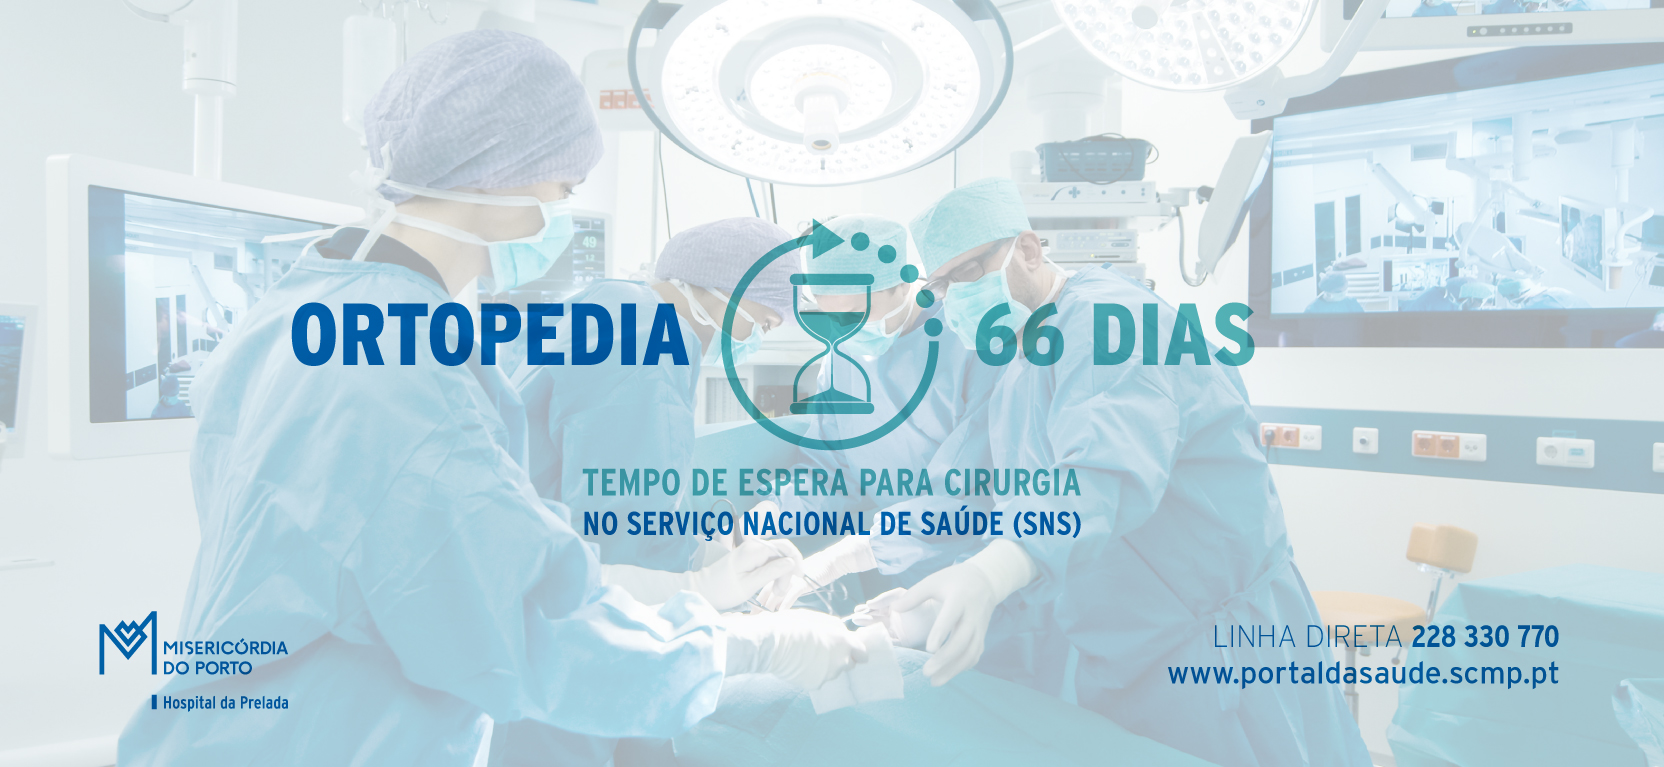 https://portaldasaude.scmp.pt/assets/misc/img/Slideshow_home/2019/Tempos%20de%20Espera/Cirurgia/maio/HP%20TE%20banner%20site%201664X767px_maio_cirurgia%20ortopedia.jpg